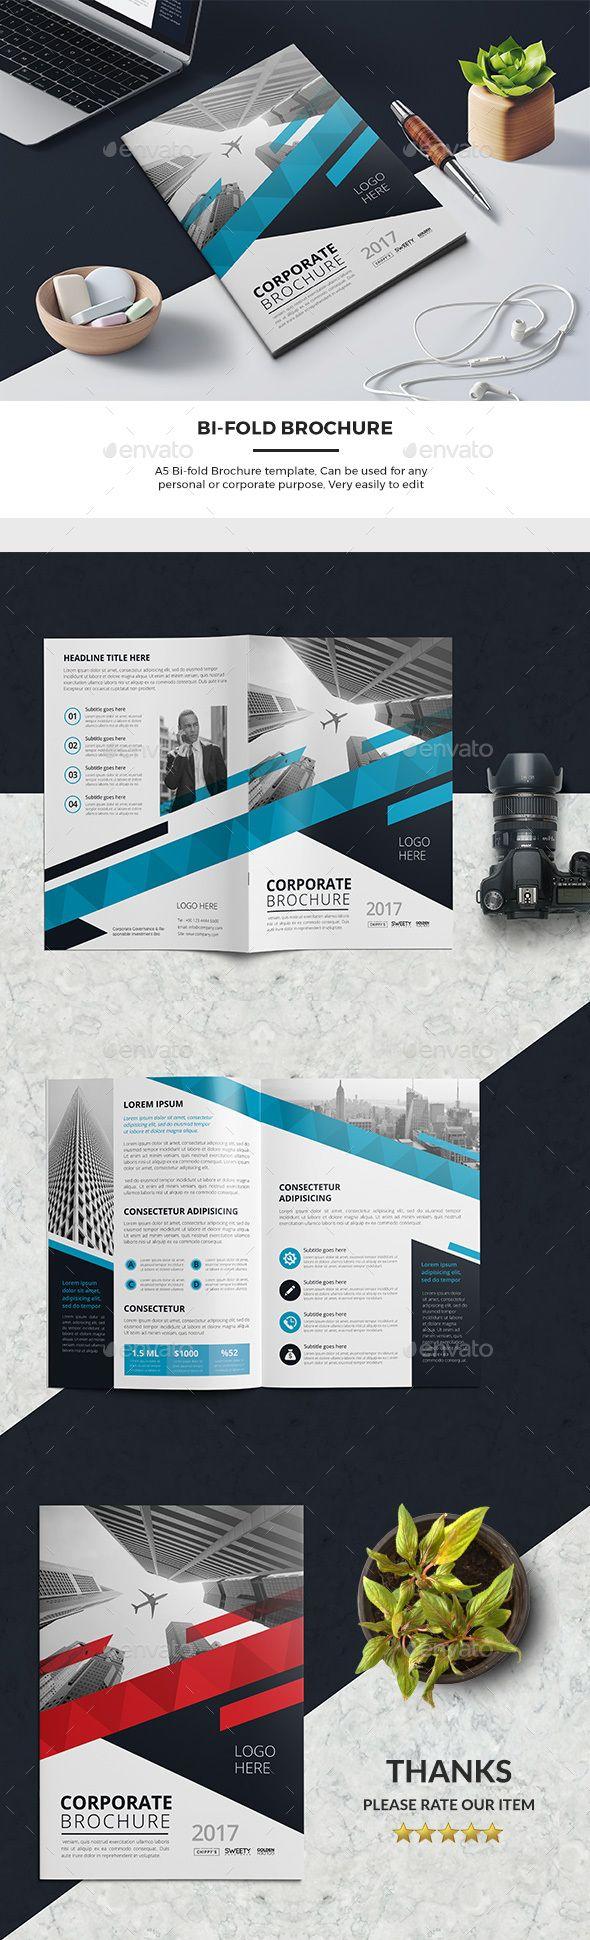 Corporate Business Bi-Fold Brochure Template - #Corporate #Business #Bifold #Brochure #Template #Design. Download here: https://graphicriver.net/item/bifold-brochure/19487639?ref=yinkira